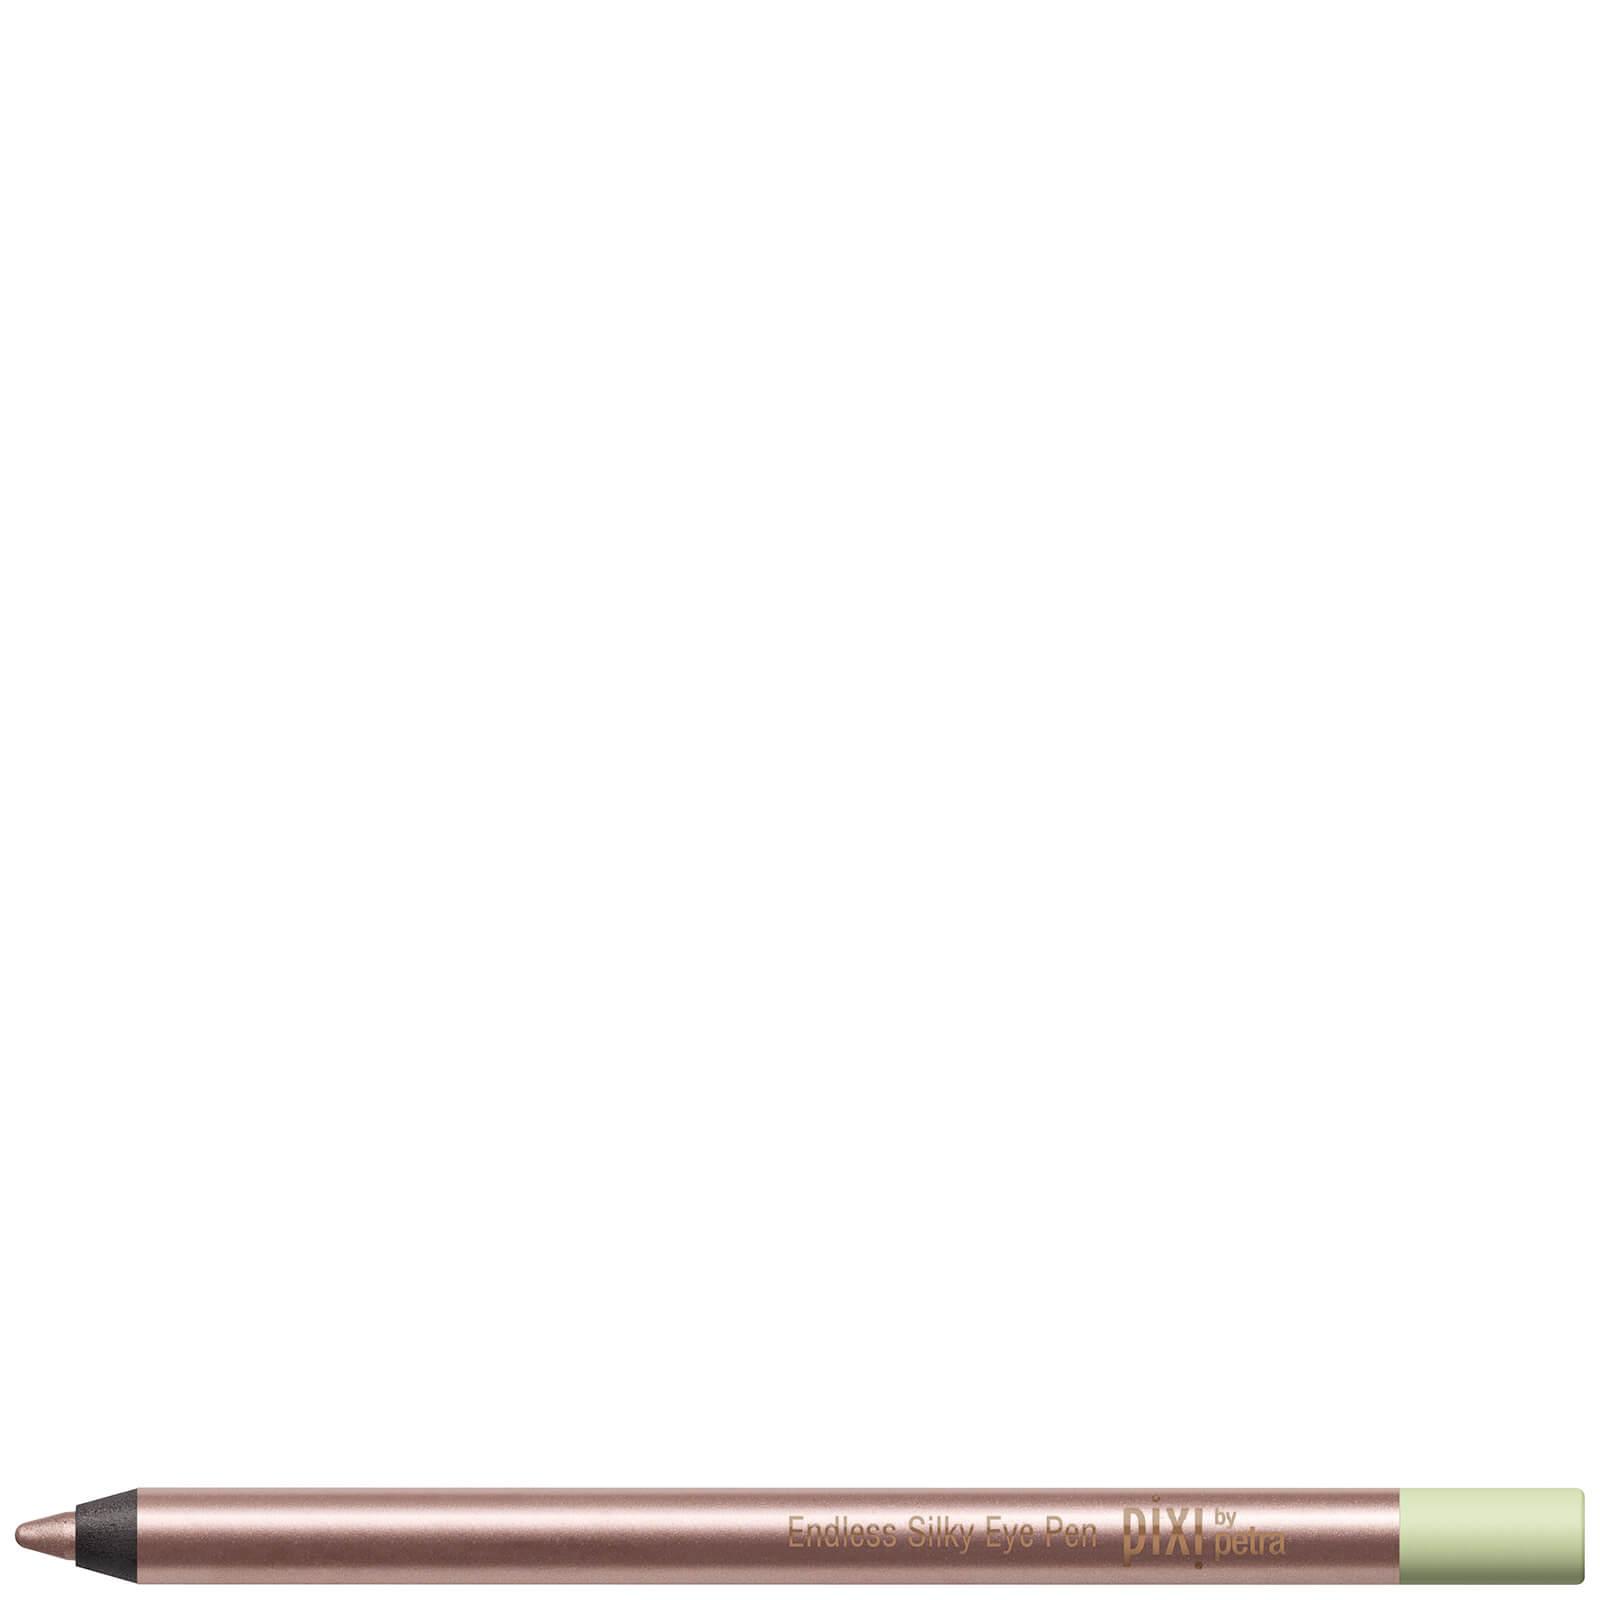 Pixi Endless Silky Eye Crayon pourles yeux - Rose Glow